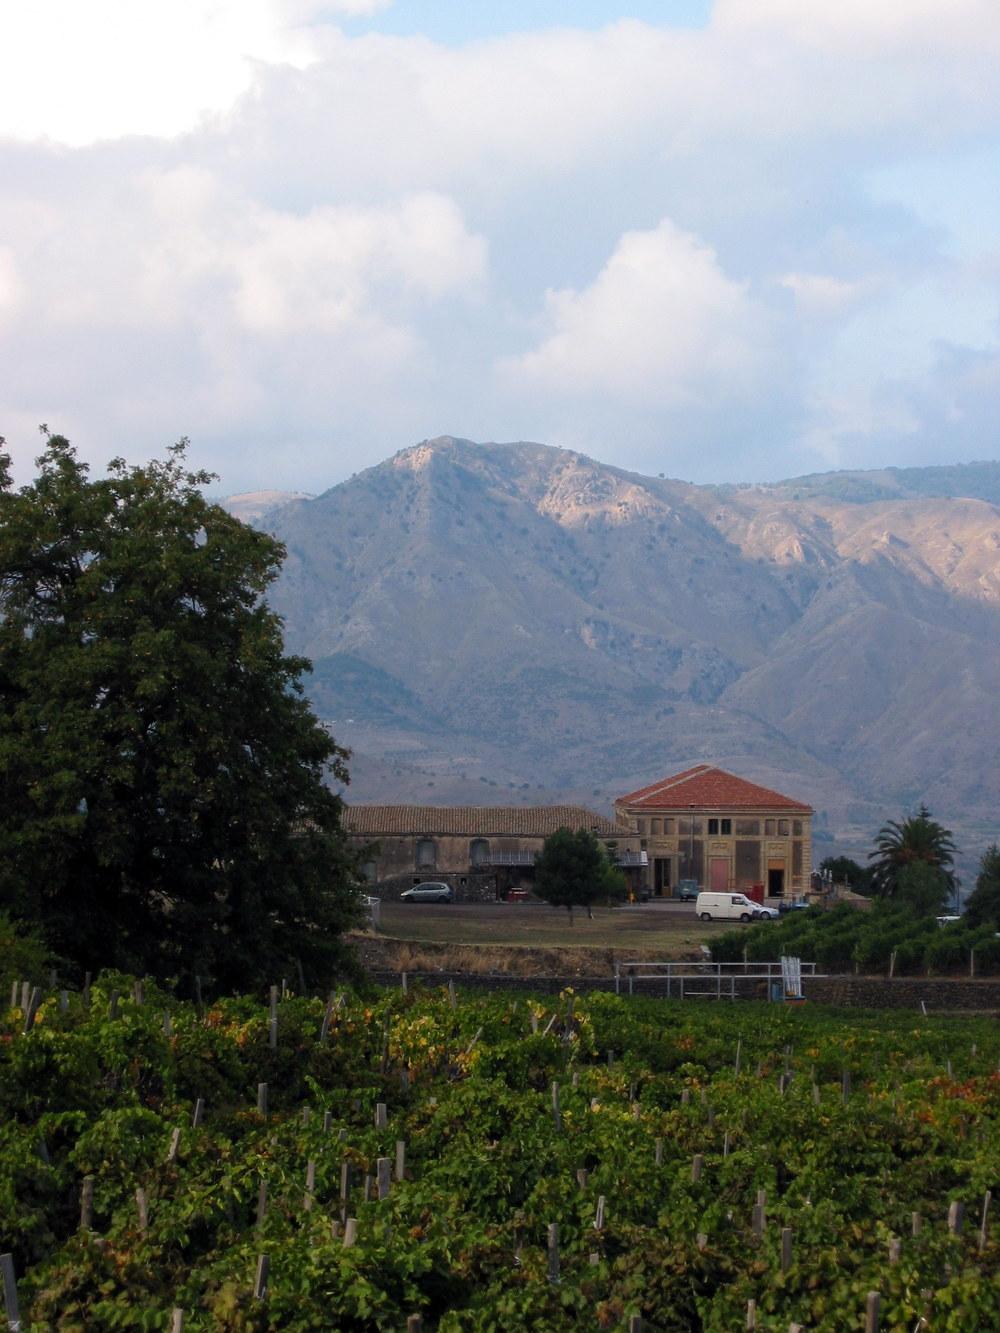 Etna_Wine,_Passopisciaro,_Sicily,_Italy.jpg